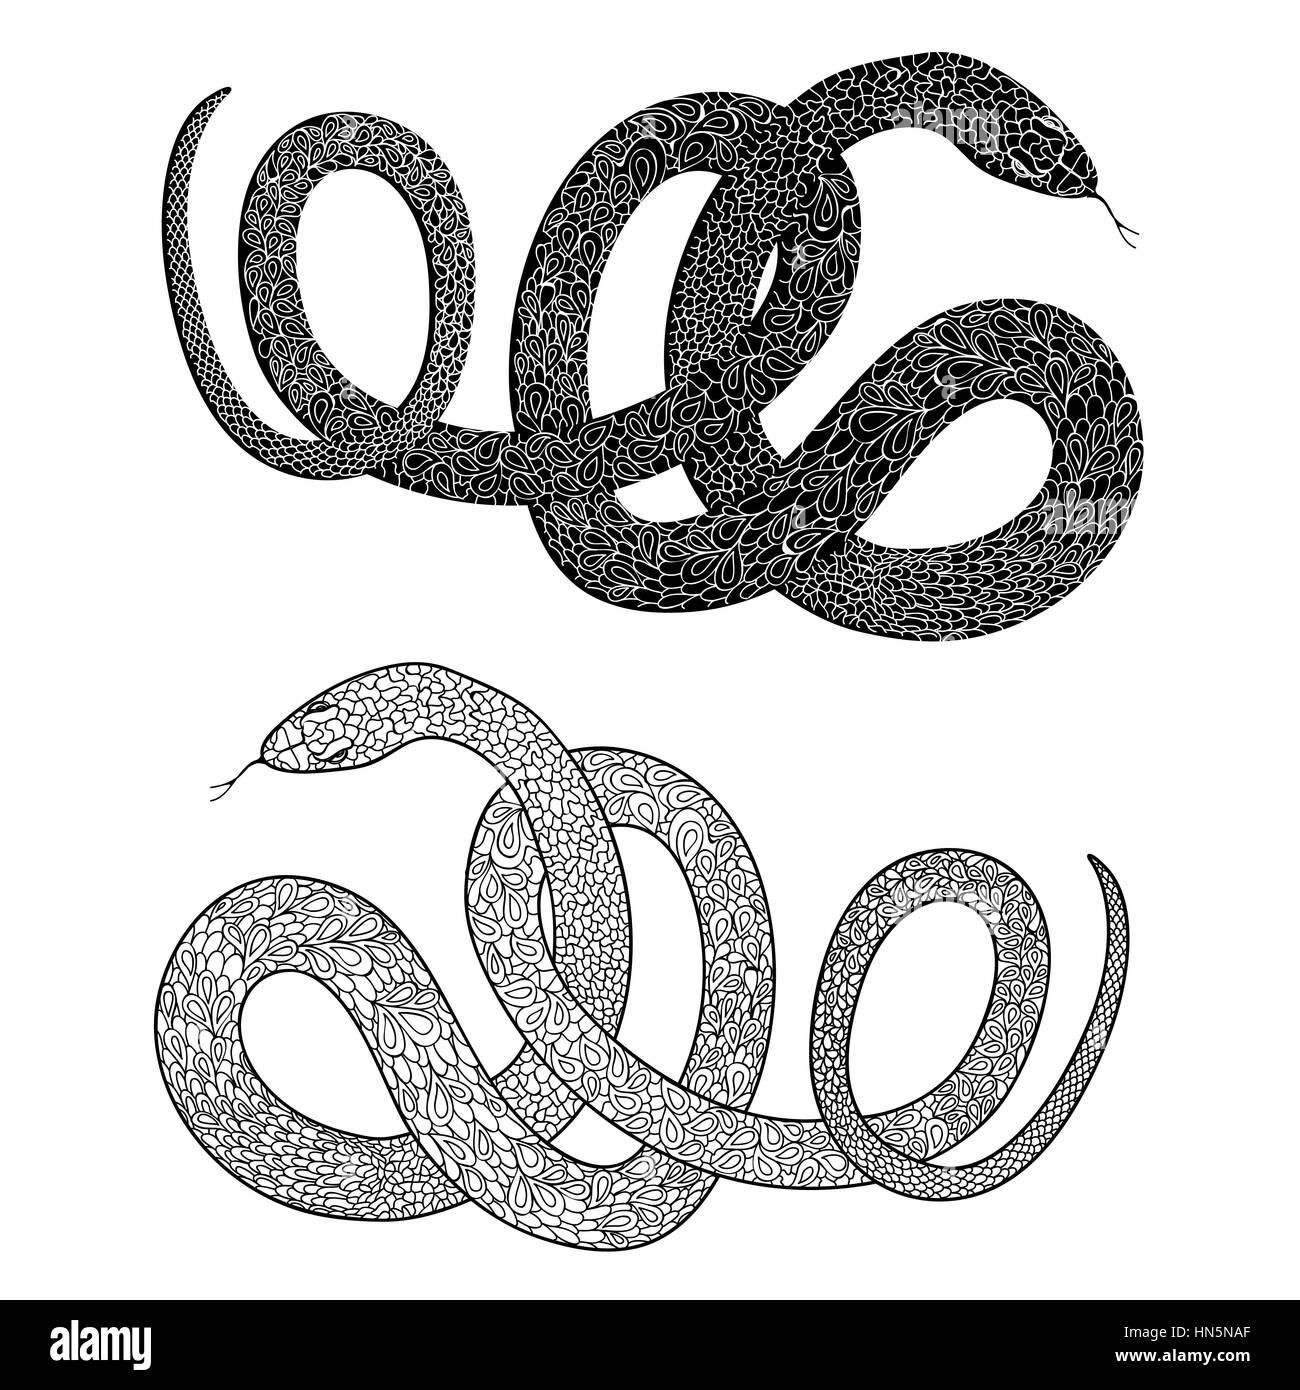 Cobra snake logo vector stockfotos cobra snake logo for Design von zierpflanzen